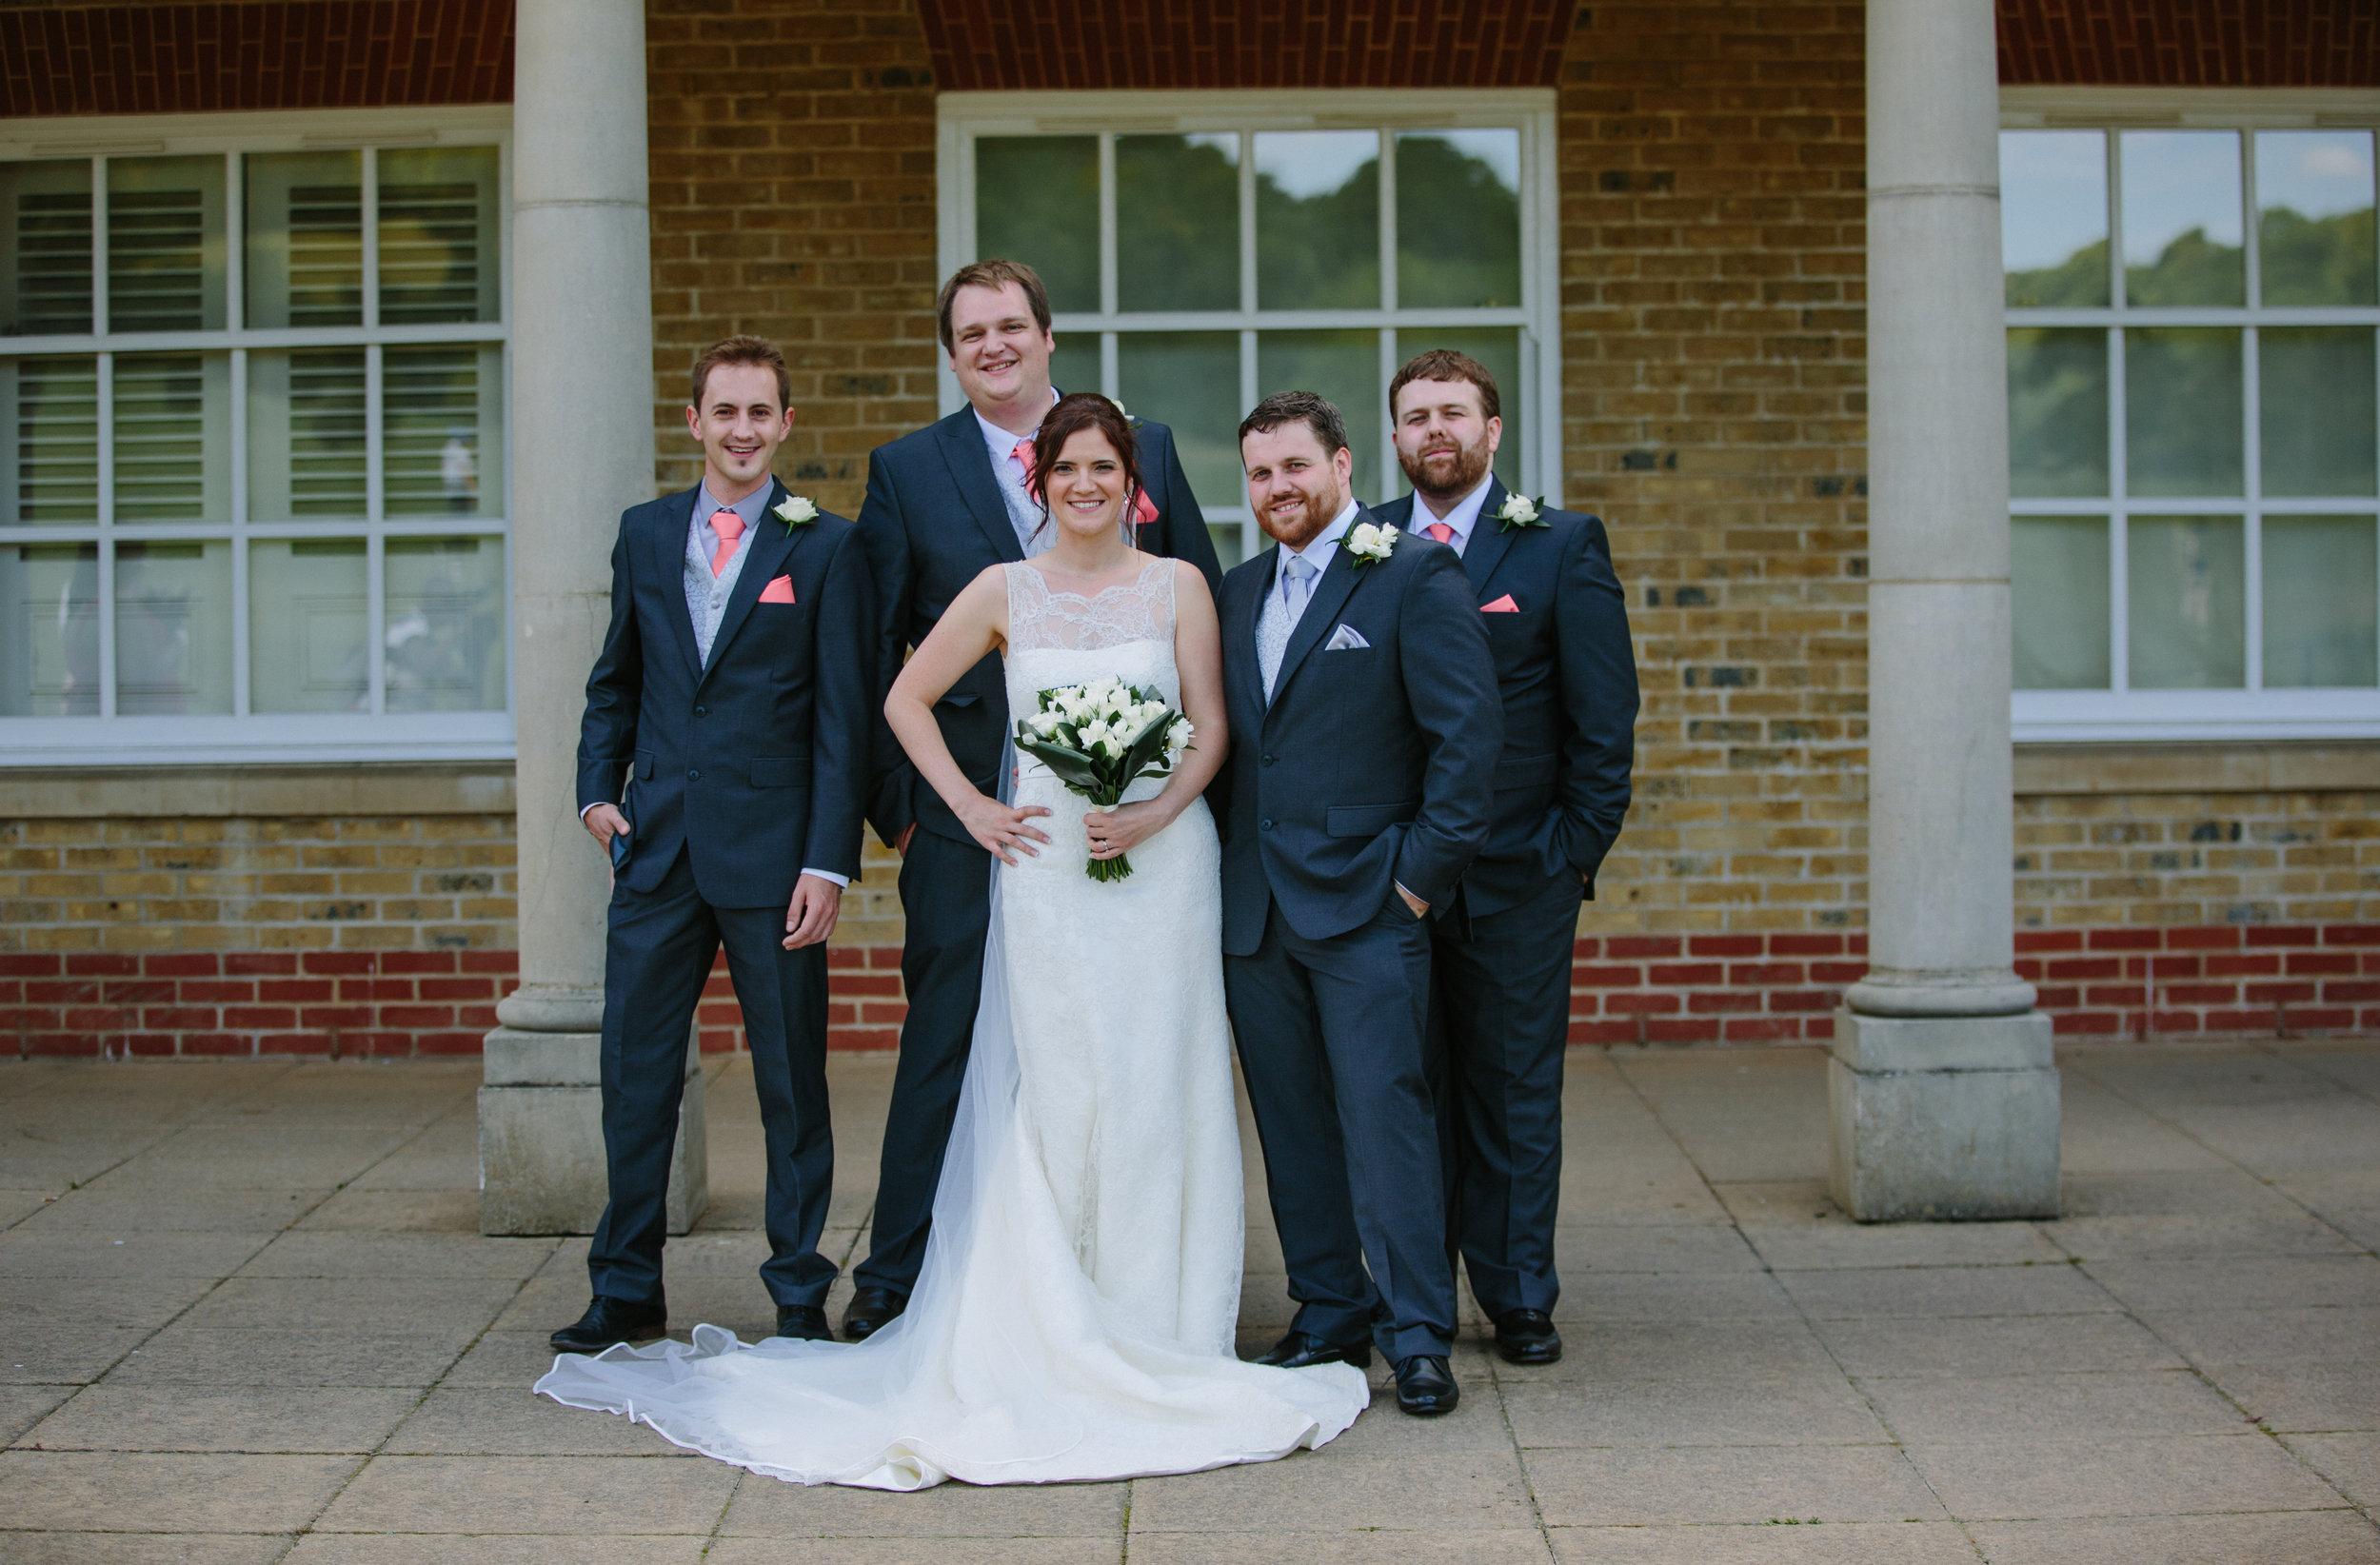 reigate-surrey-london-wedding-photography-group-formal-shot-groomsmen-79